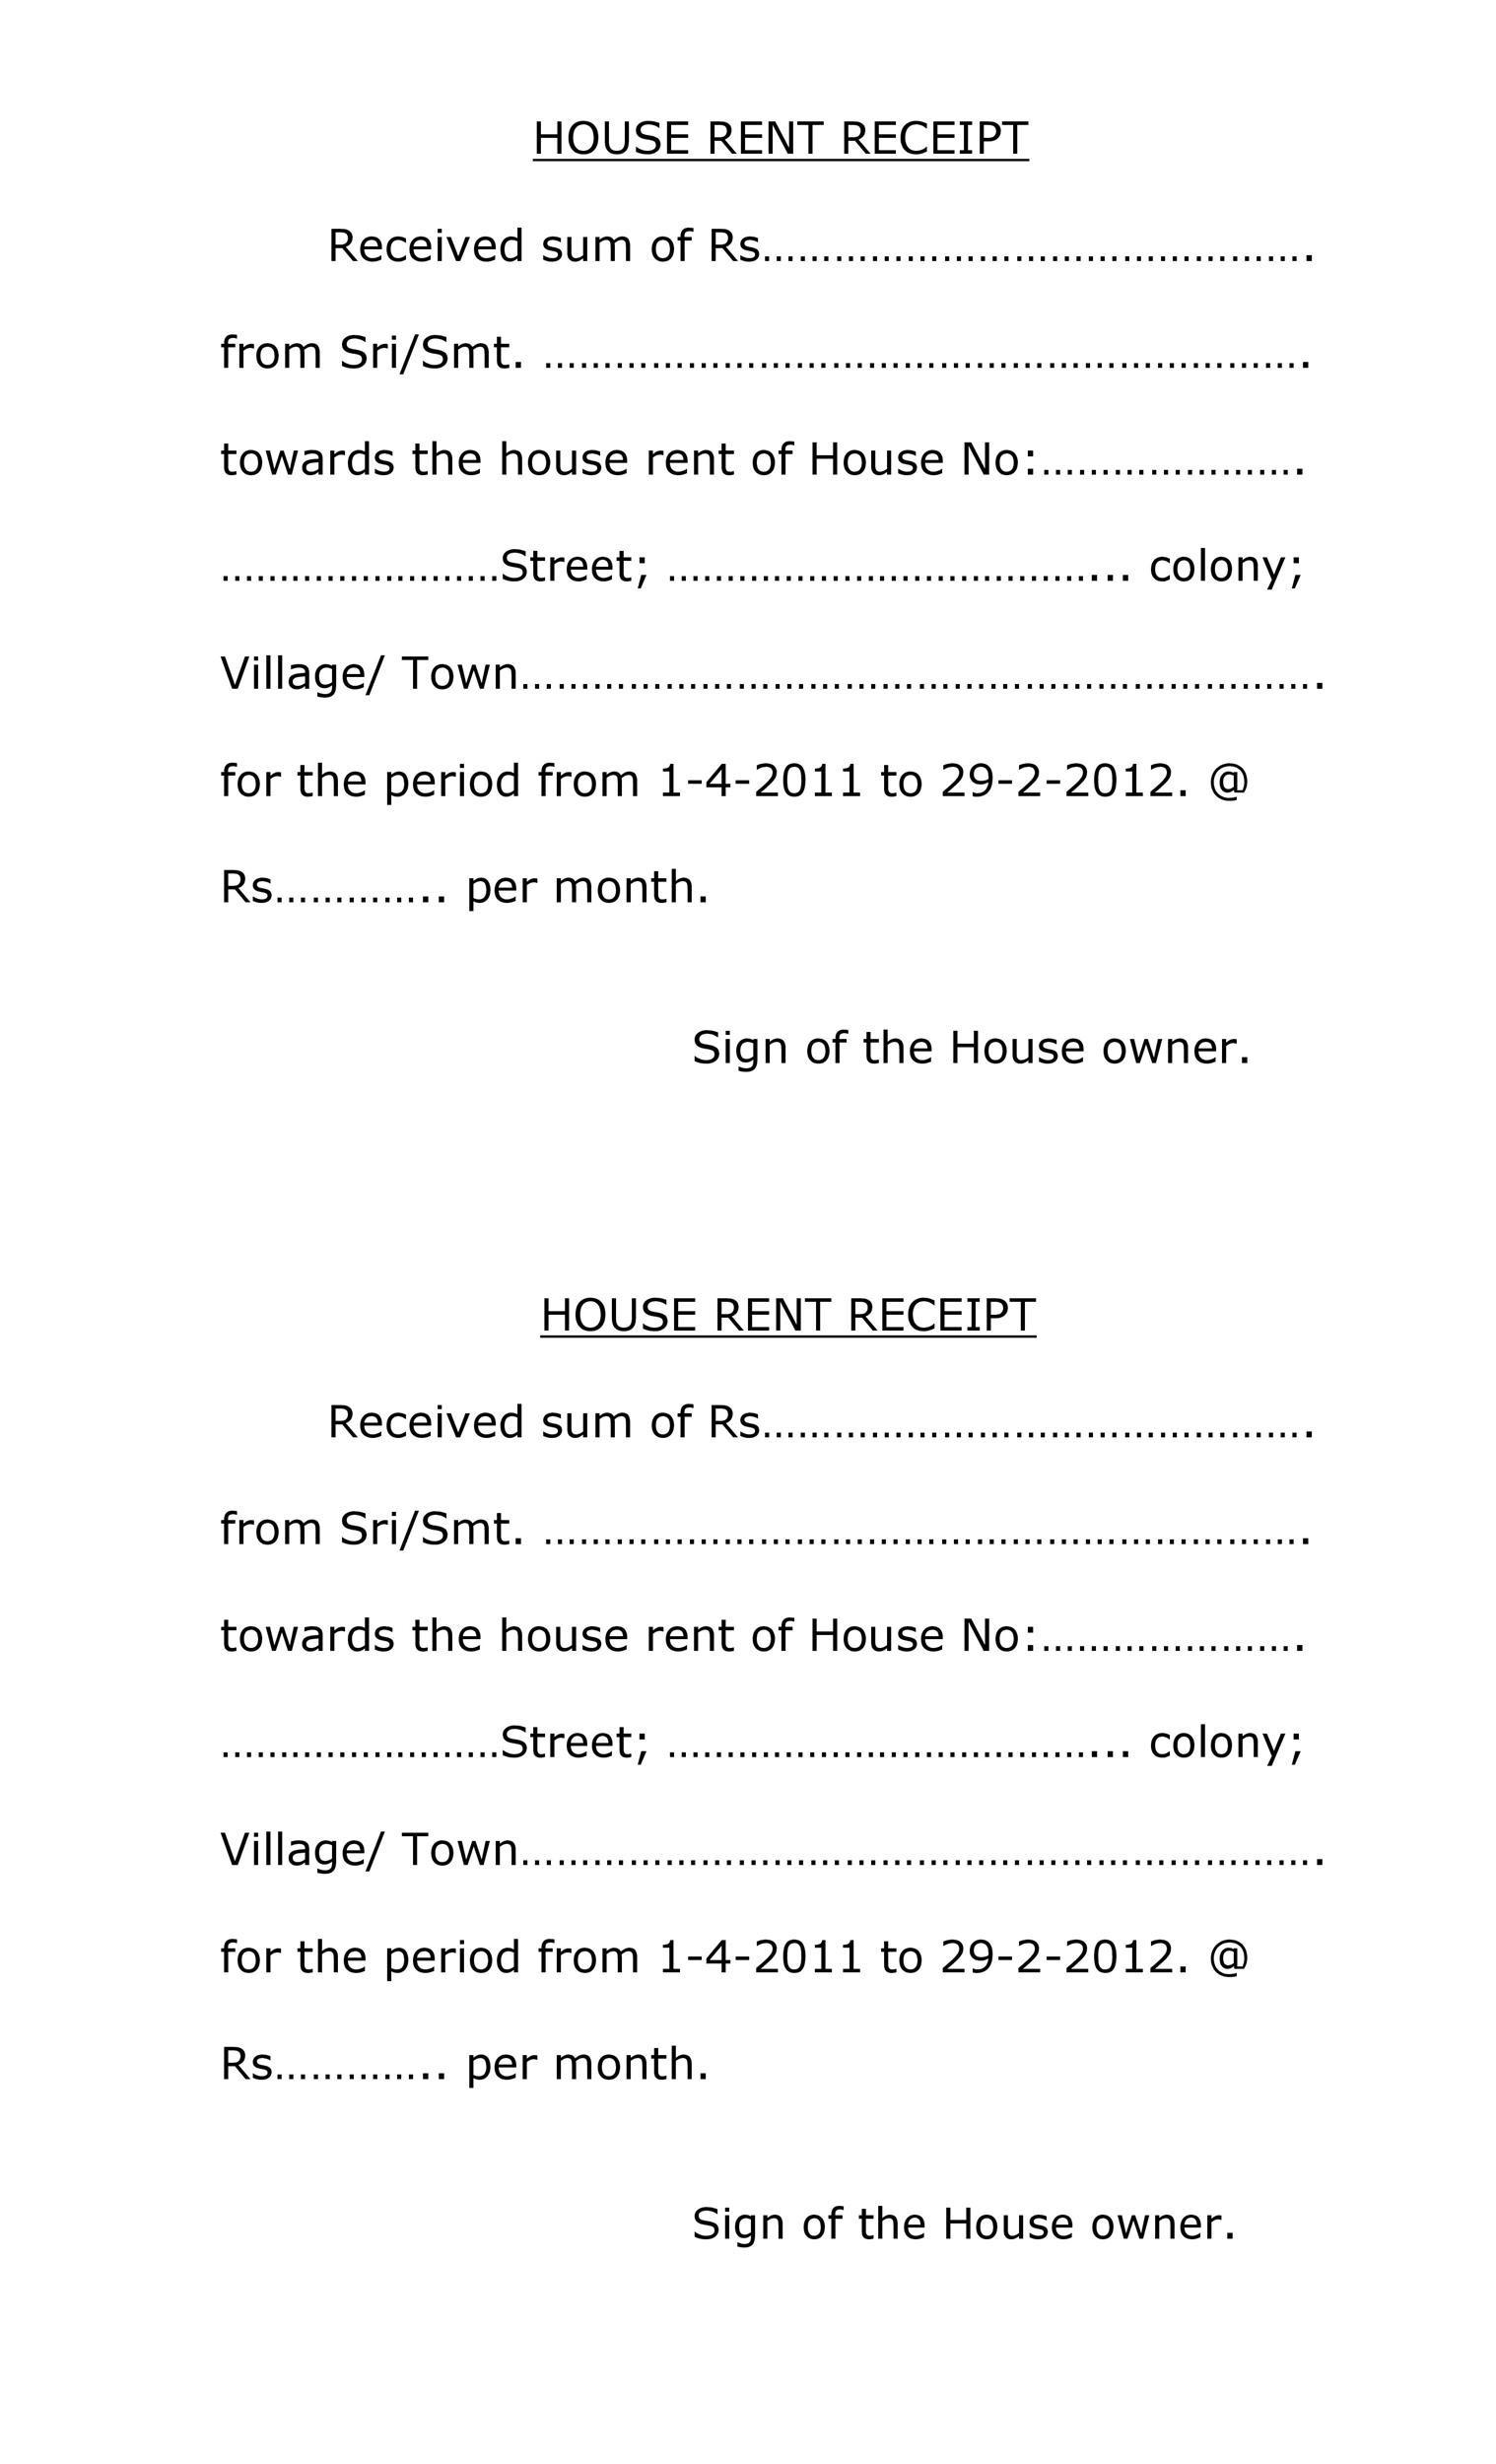 Free rent receipt 31